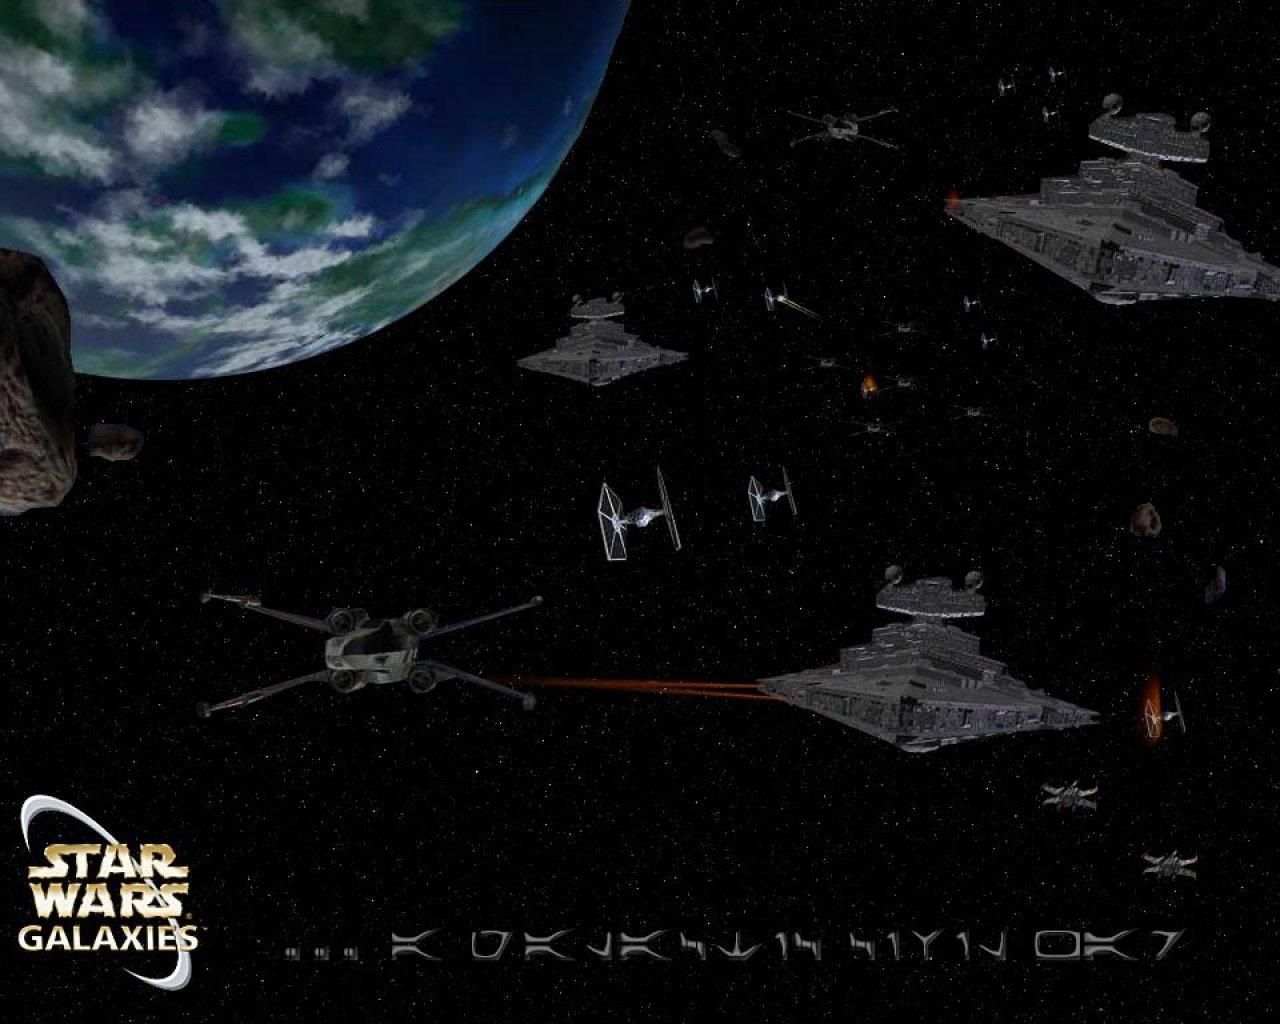 Starwars Galaxies Wallpapers Download Starwars Galaxies Wallpapers Starwars Galaxies Desktop Wallpapers In High Resolution Kingdom Hearts Insider